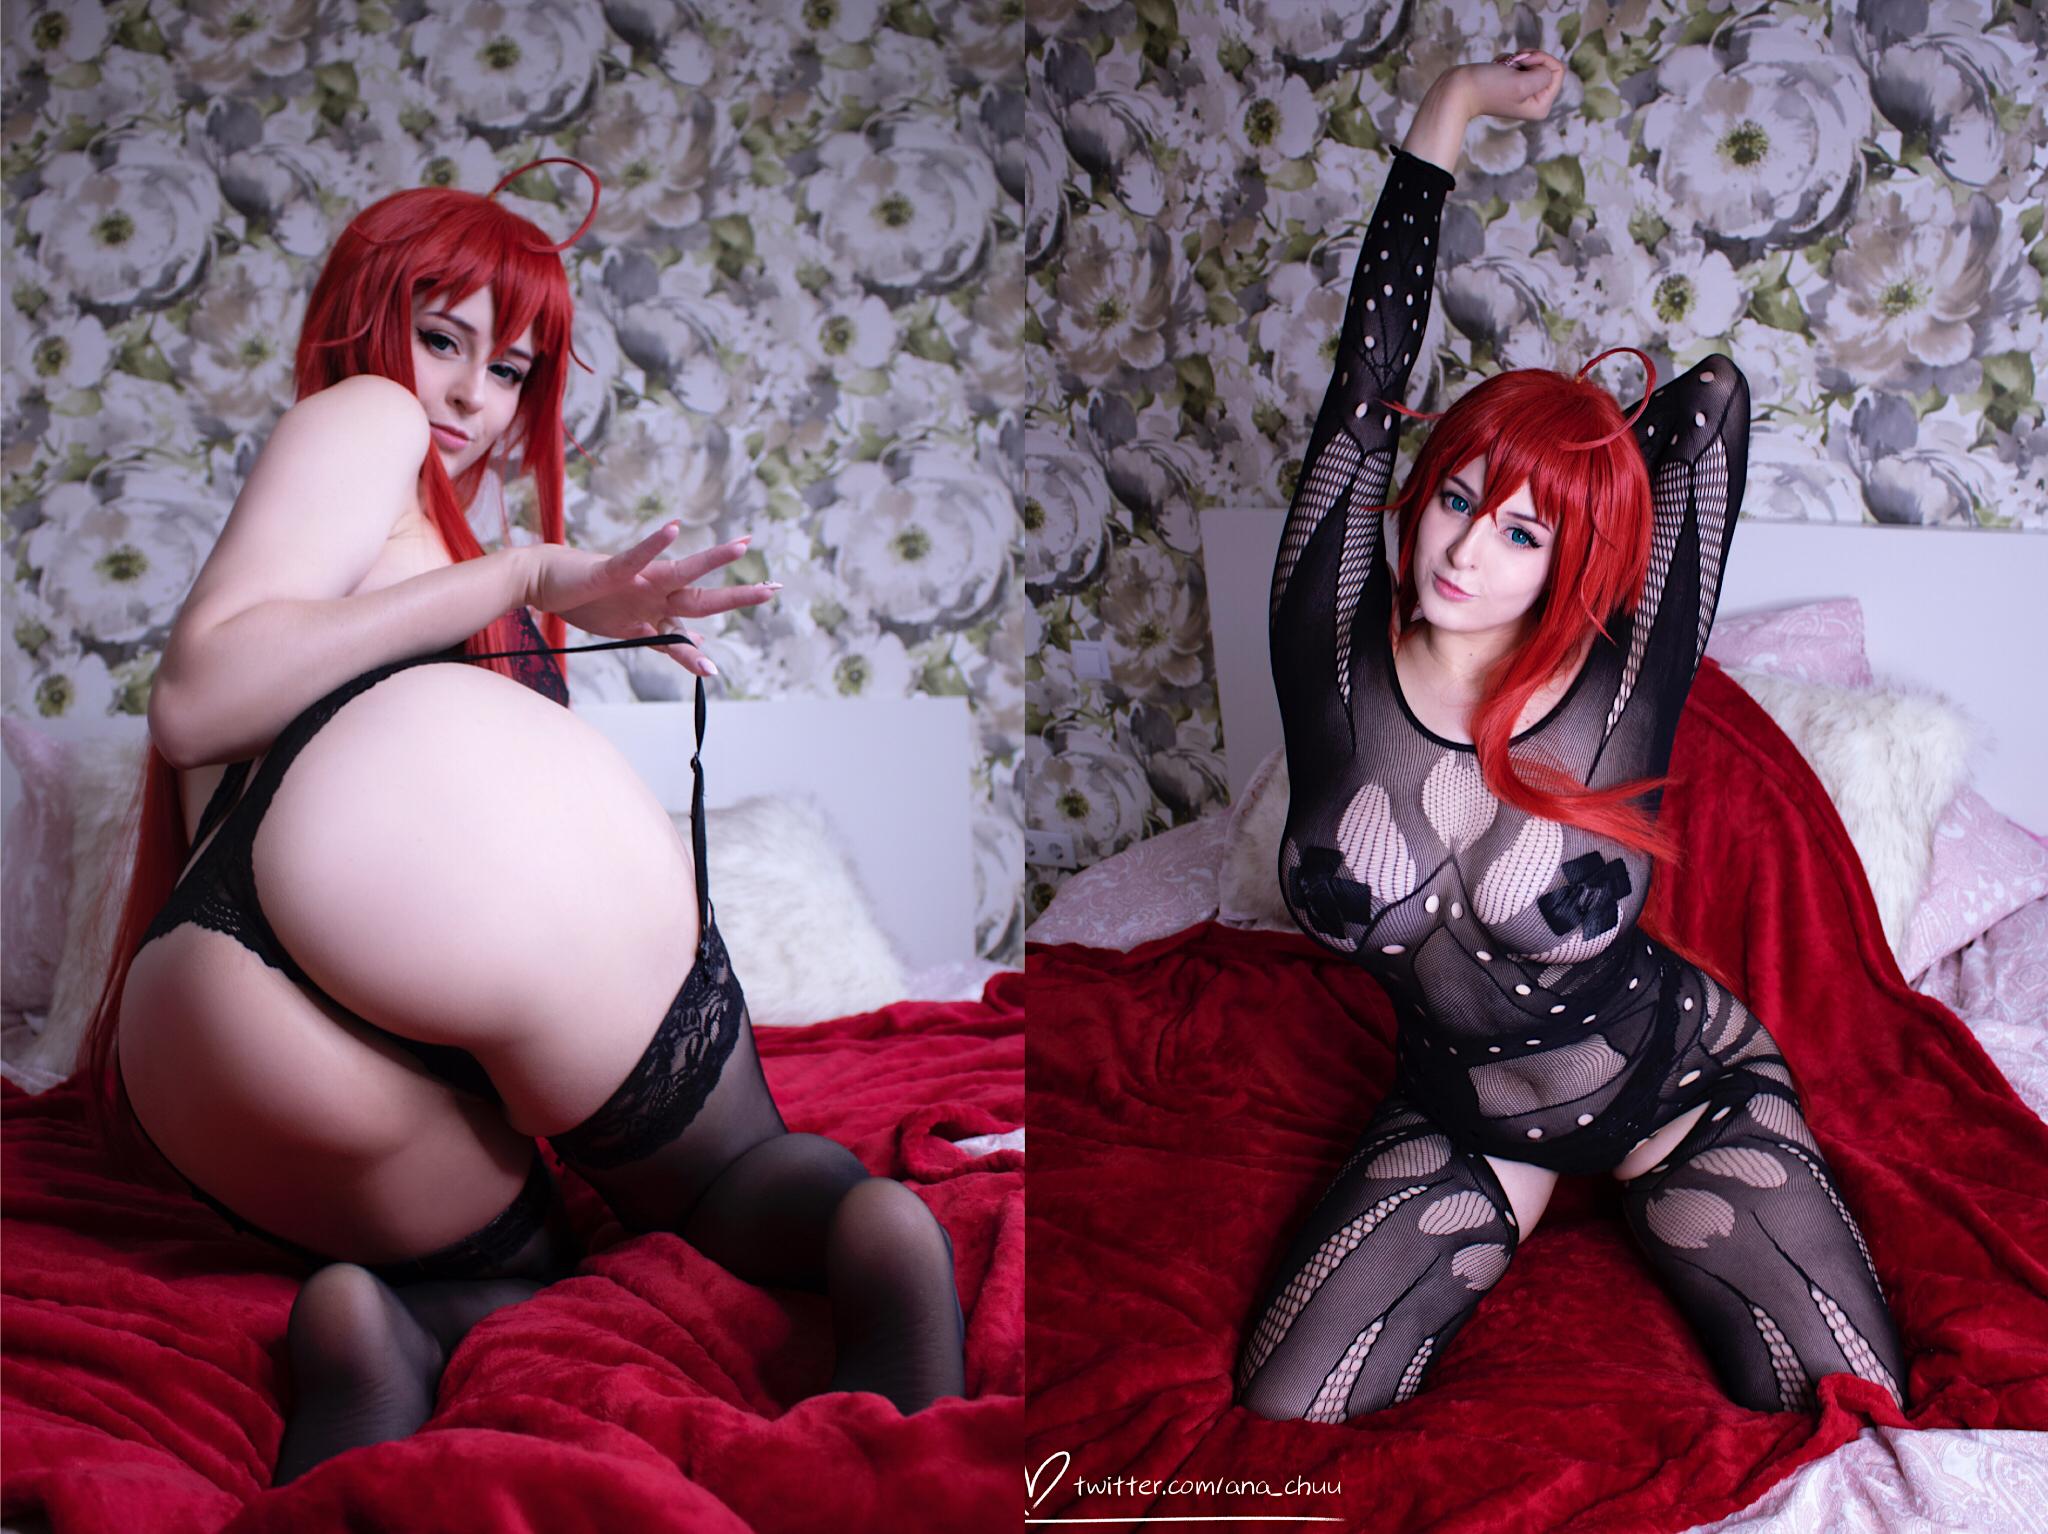 Rias Trying To Show You Her Naughtiest Side😈 Erocosplay By Ana Chuu